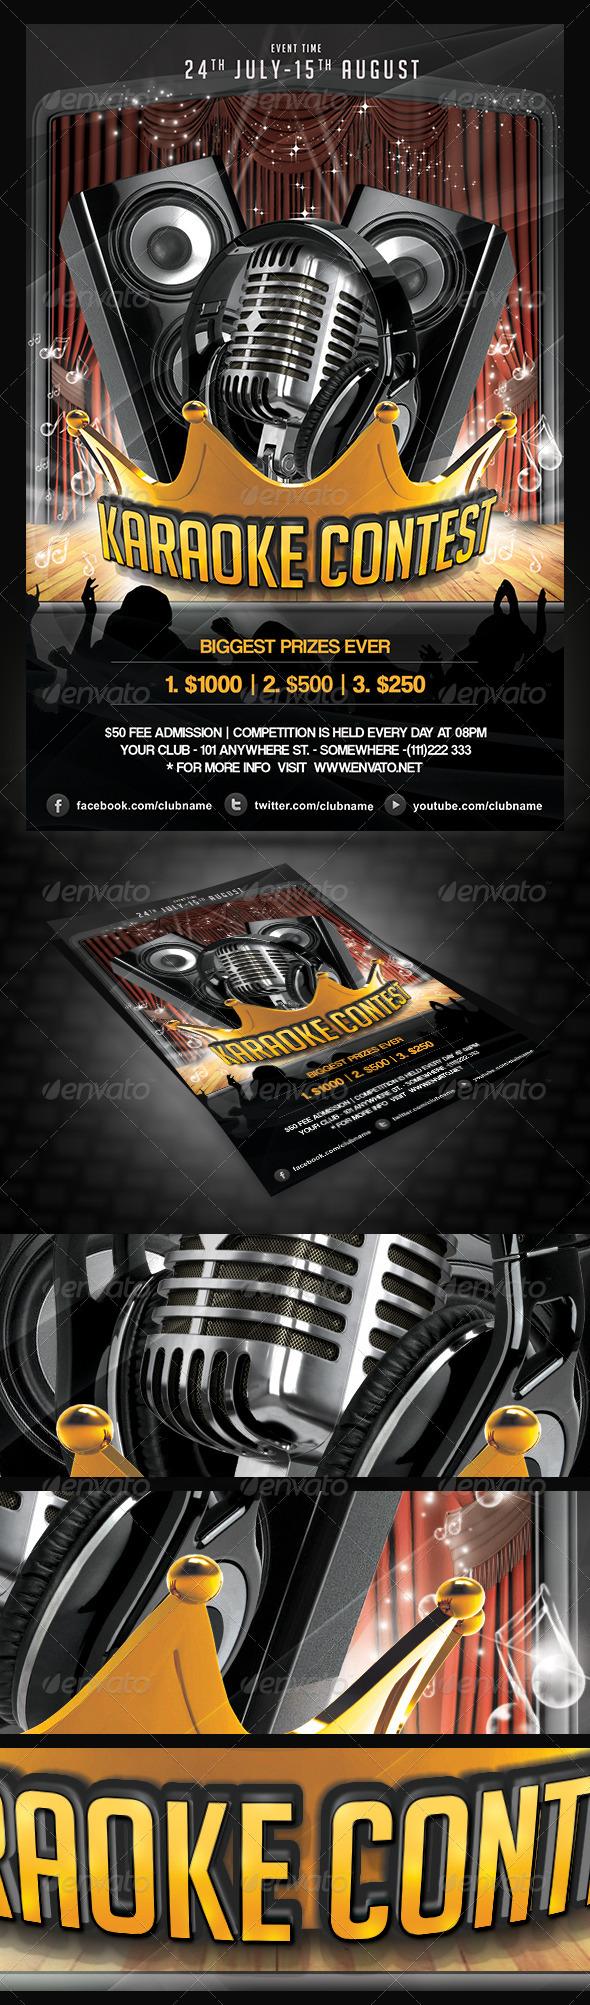 Karaoke Contest Flyer - Events Flyers